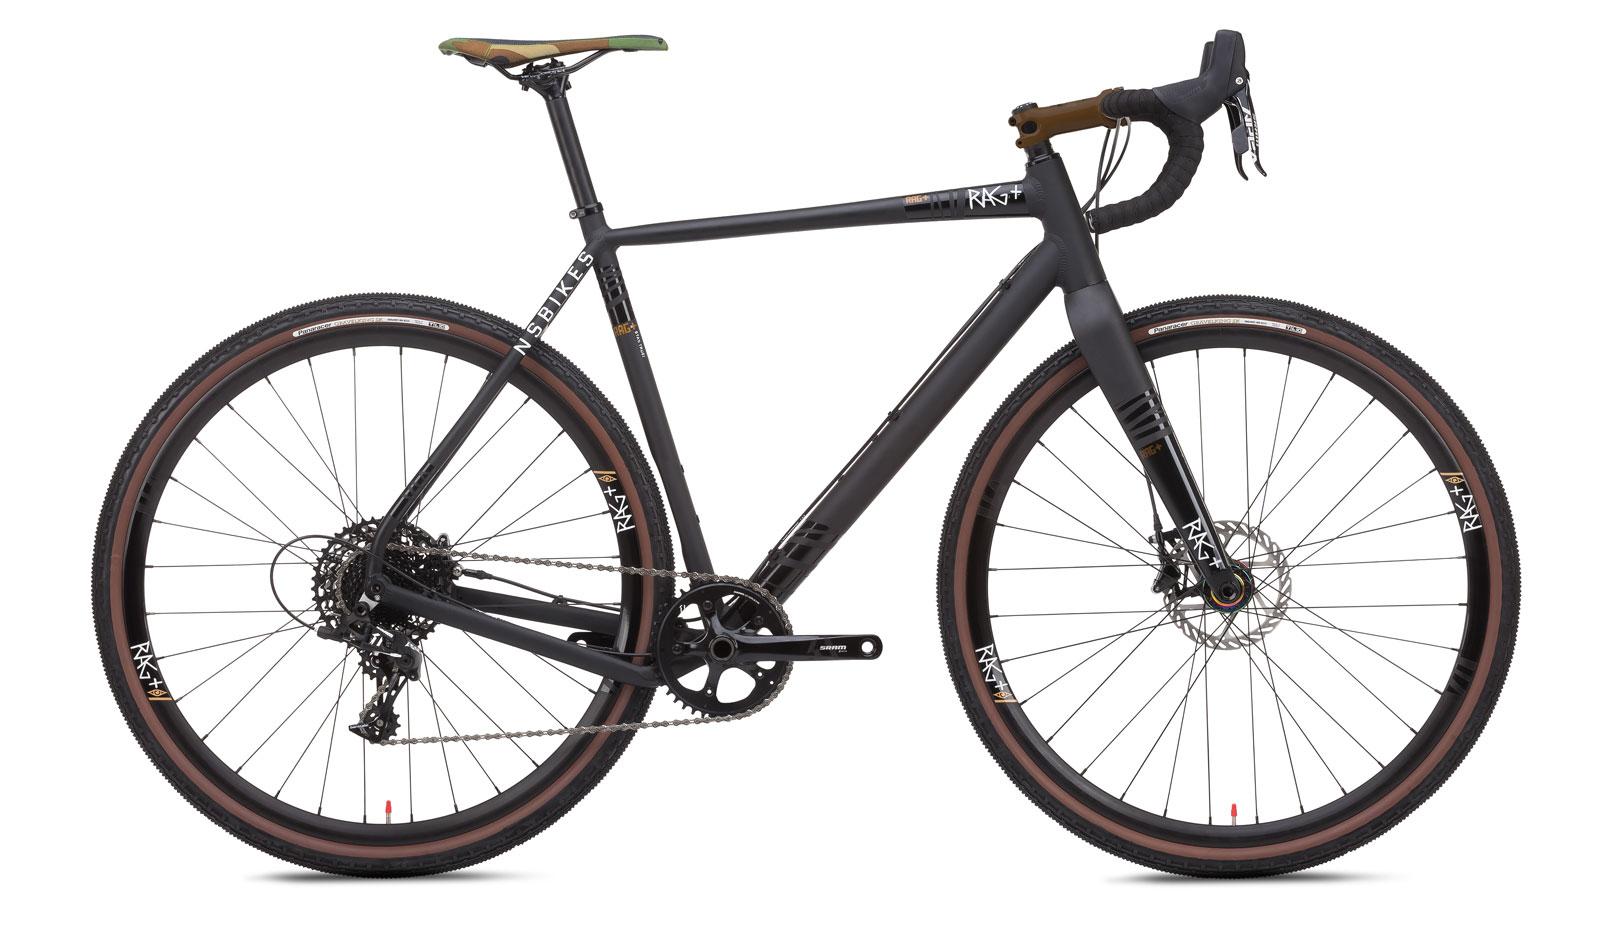 Raleigh CX Carbon Bike Fork 700c 1 1//8-1.5 Tapered Disc 15X100 Thru Axle